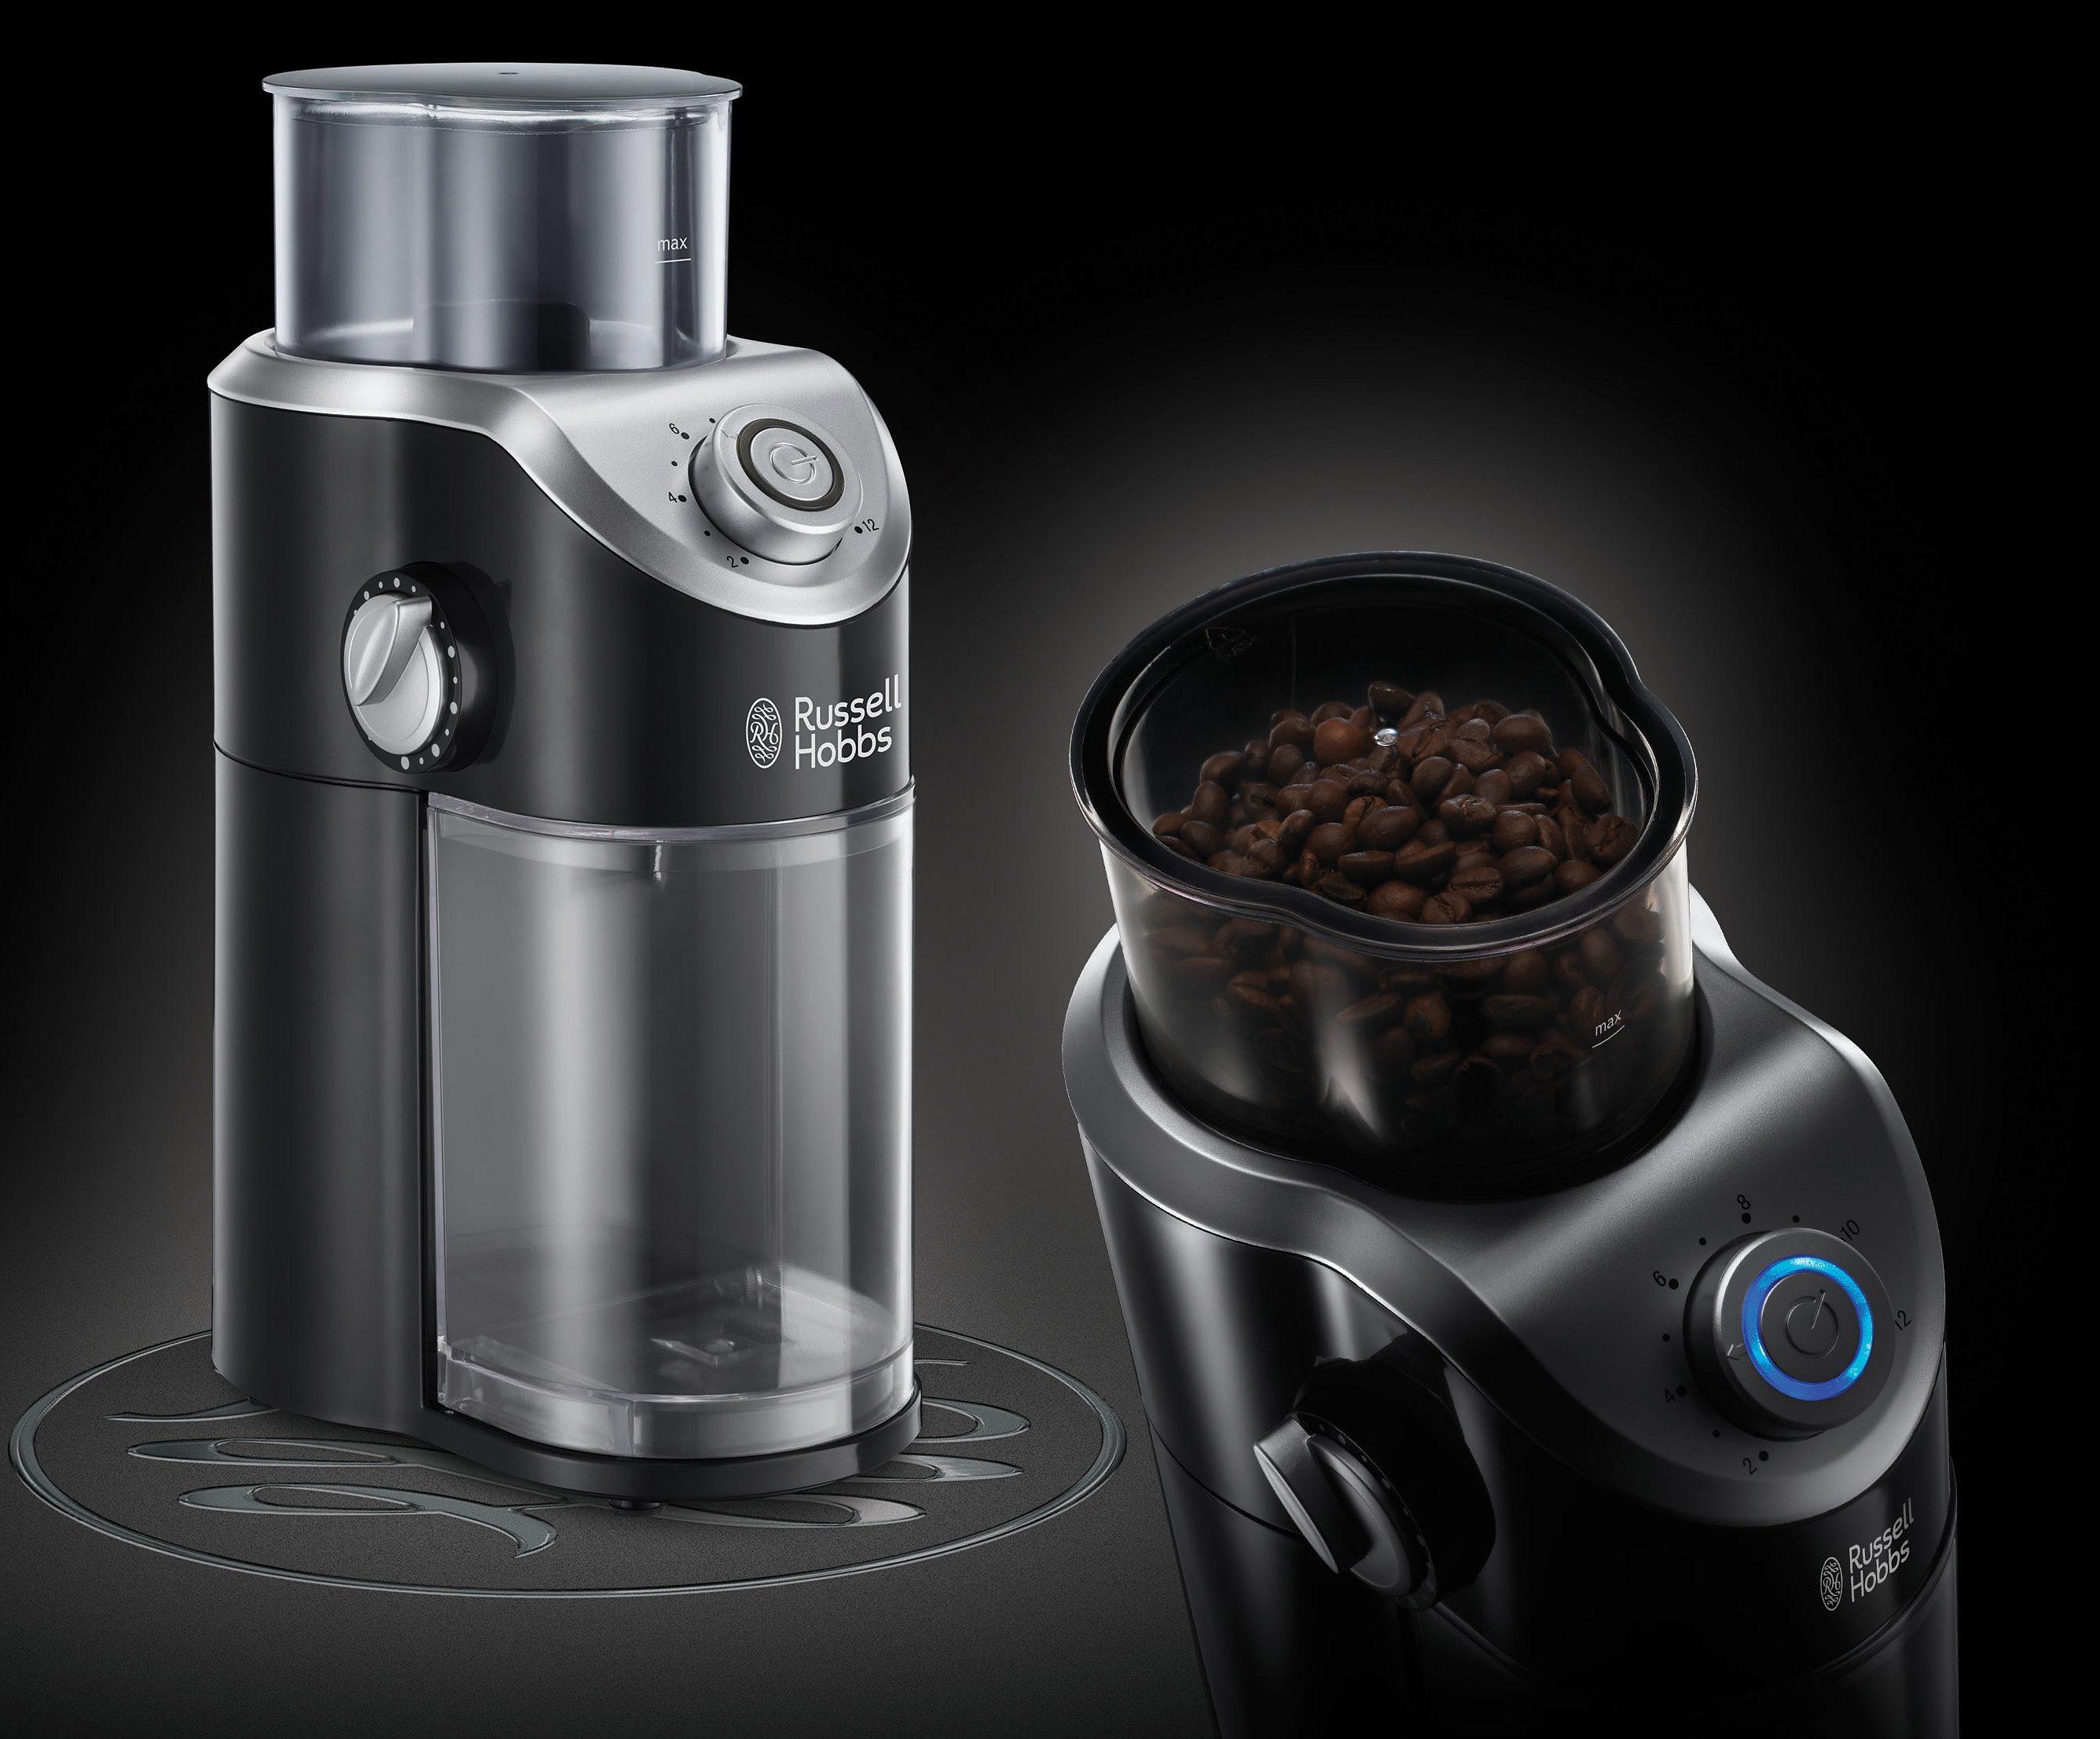 Russell Hobbs Kaffeemühle Classics 23120-56 mit hochwertigem Scheibenmahlwerk, 140 Watt